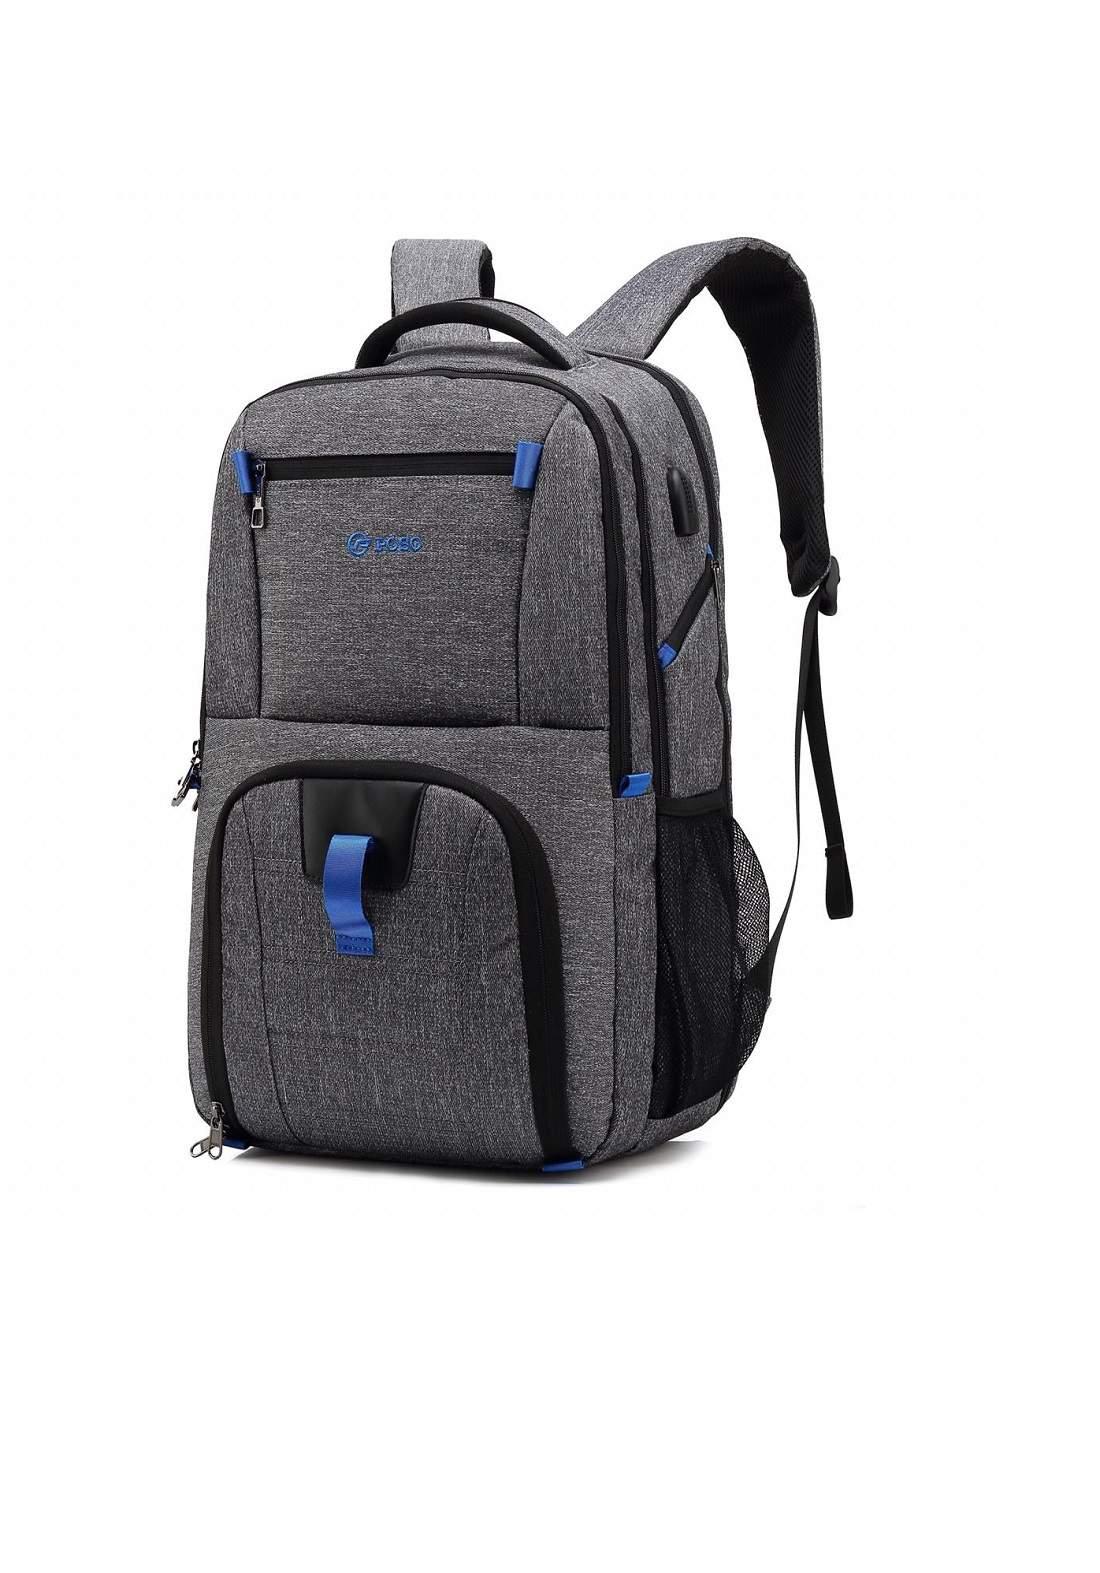 Poso PS-501 Laptop Bag-Grey حقيبة لابتوب